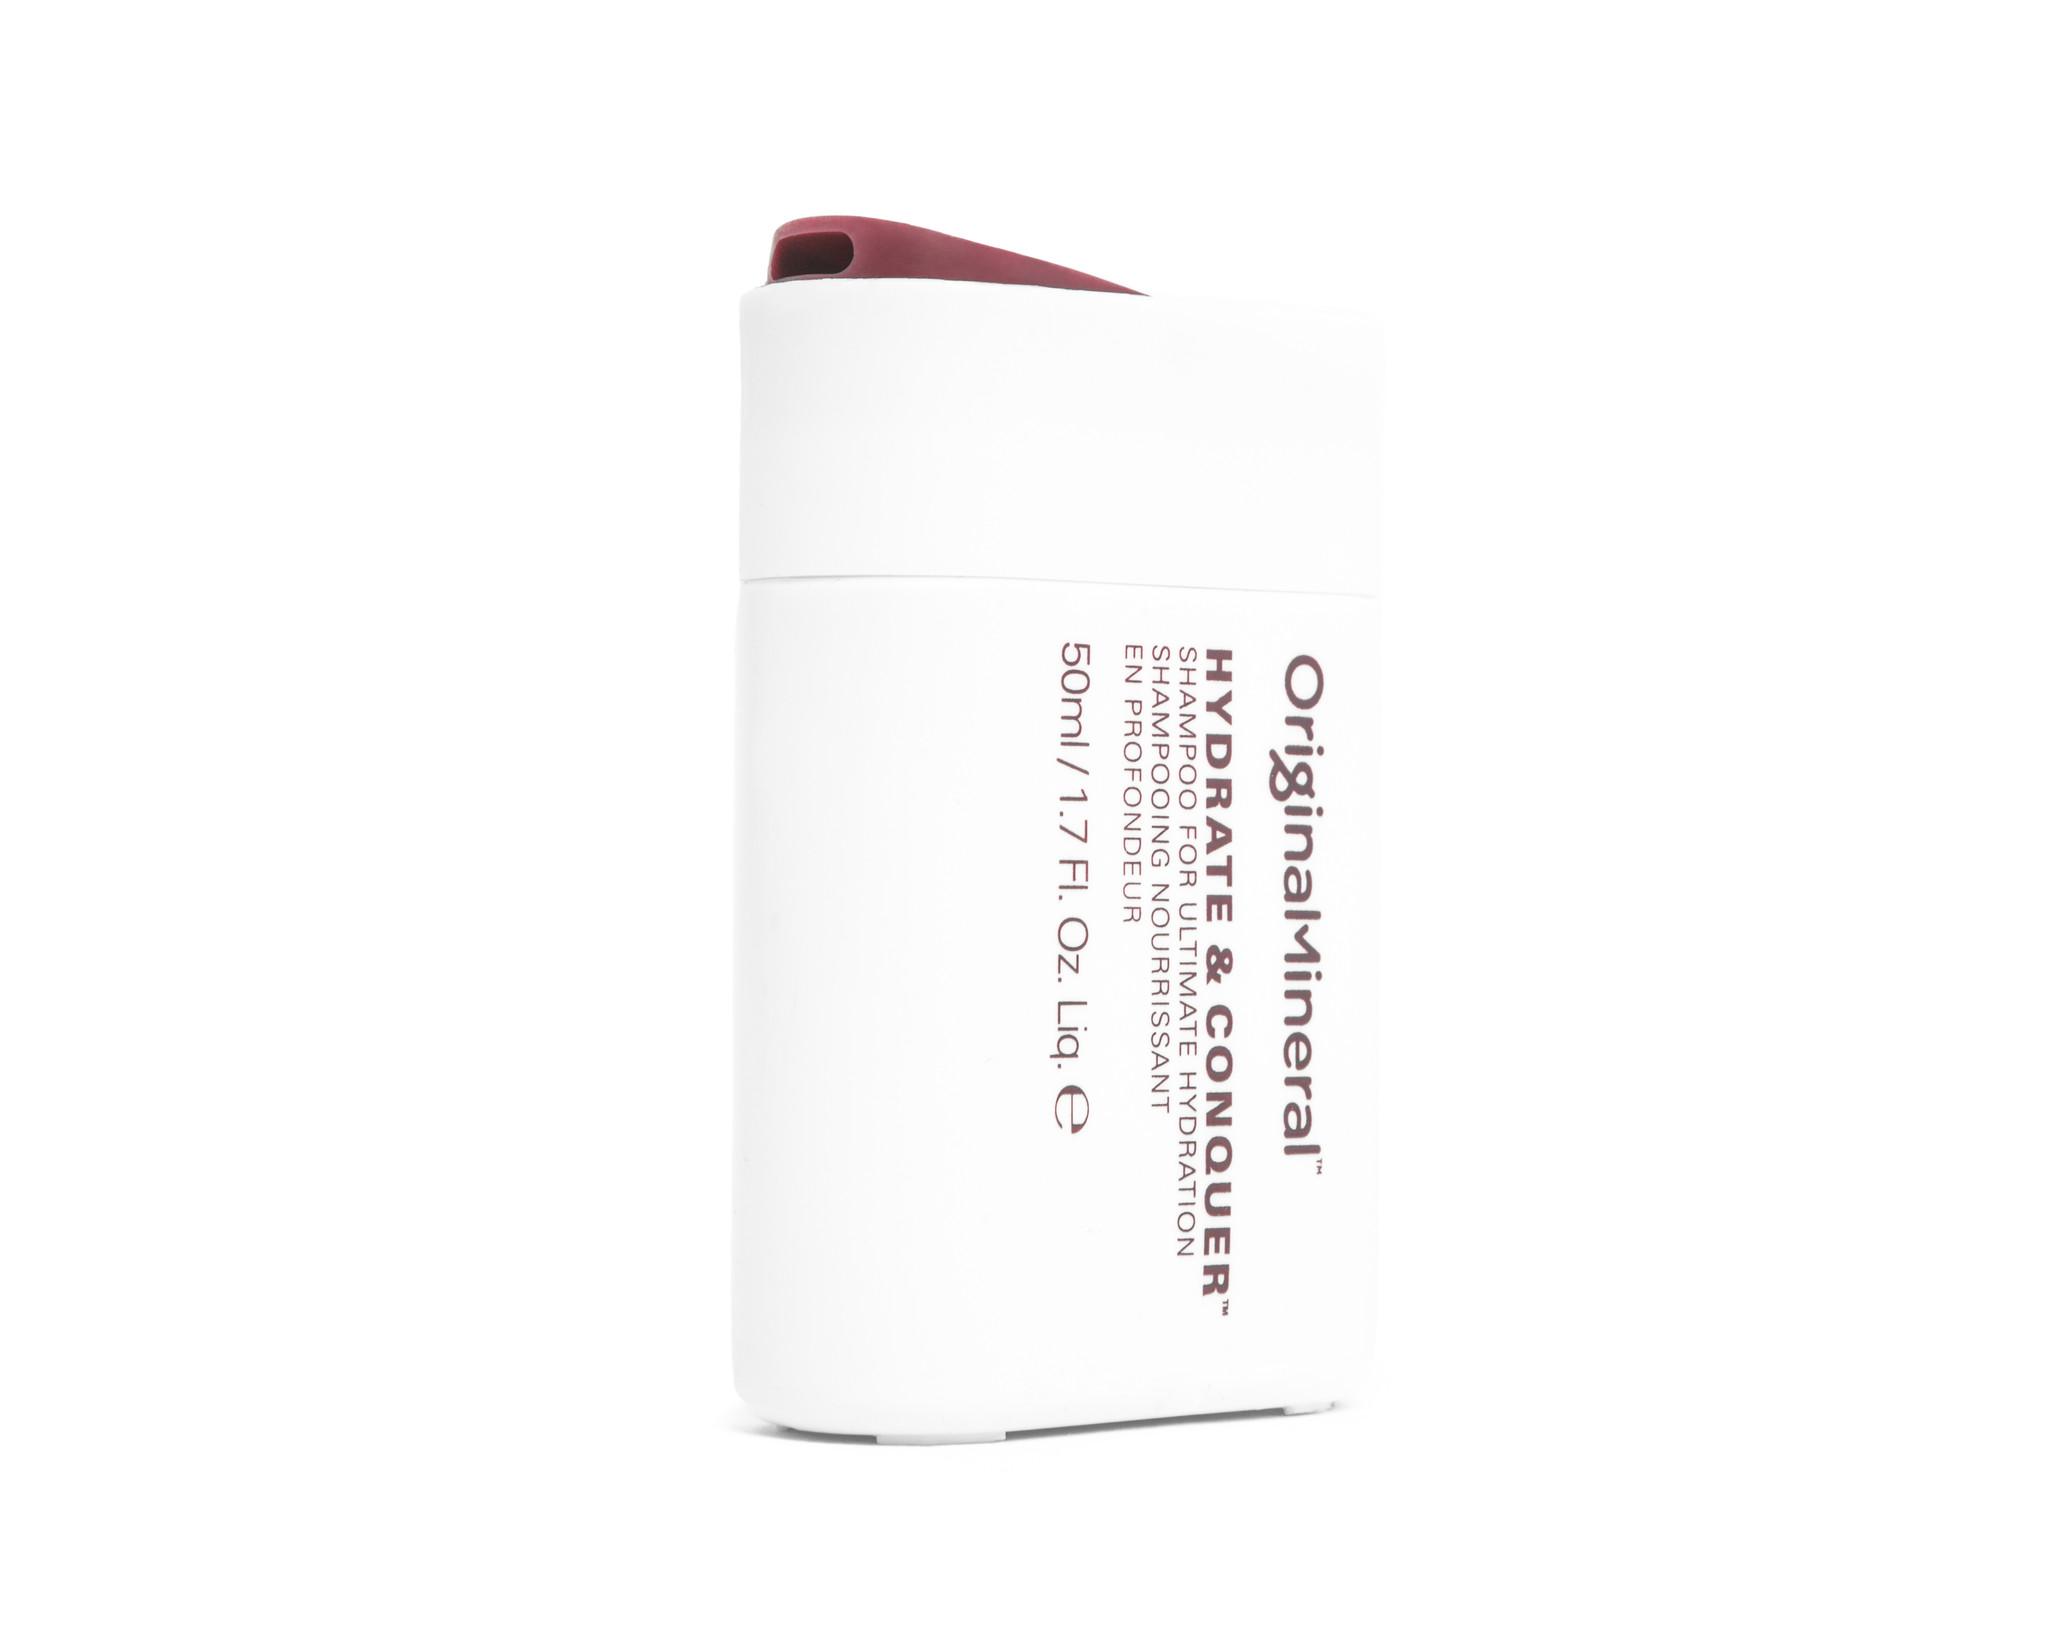 O&M - Original Mineral O&M Hydrate & Conquer Shampooing Nourissant en profondeur - 50ml